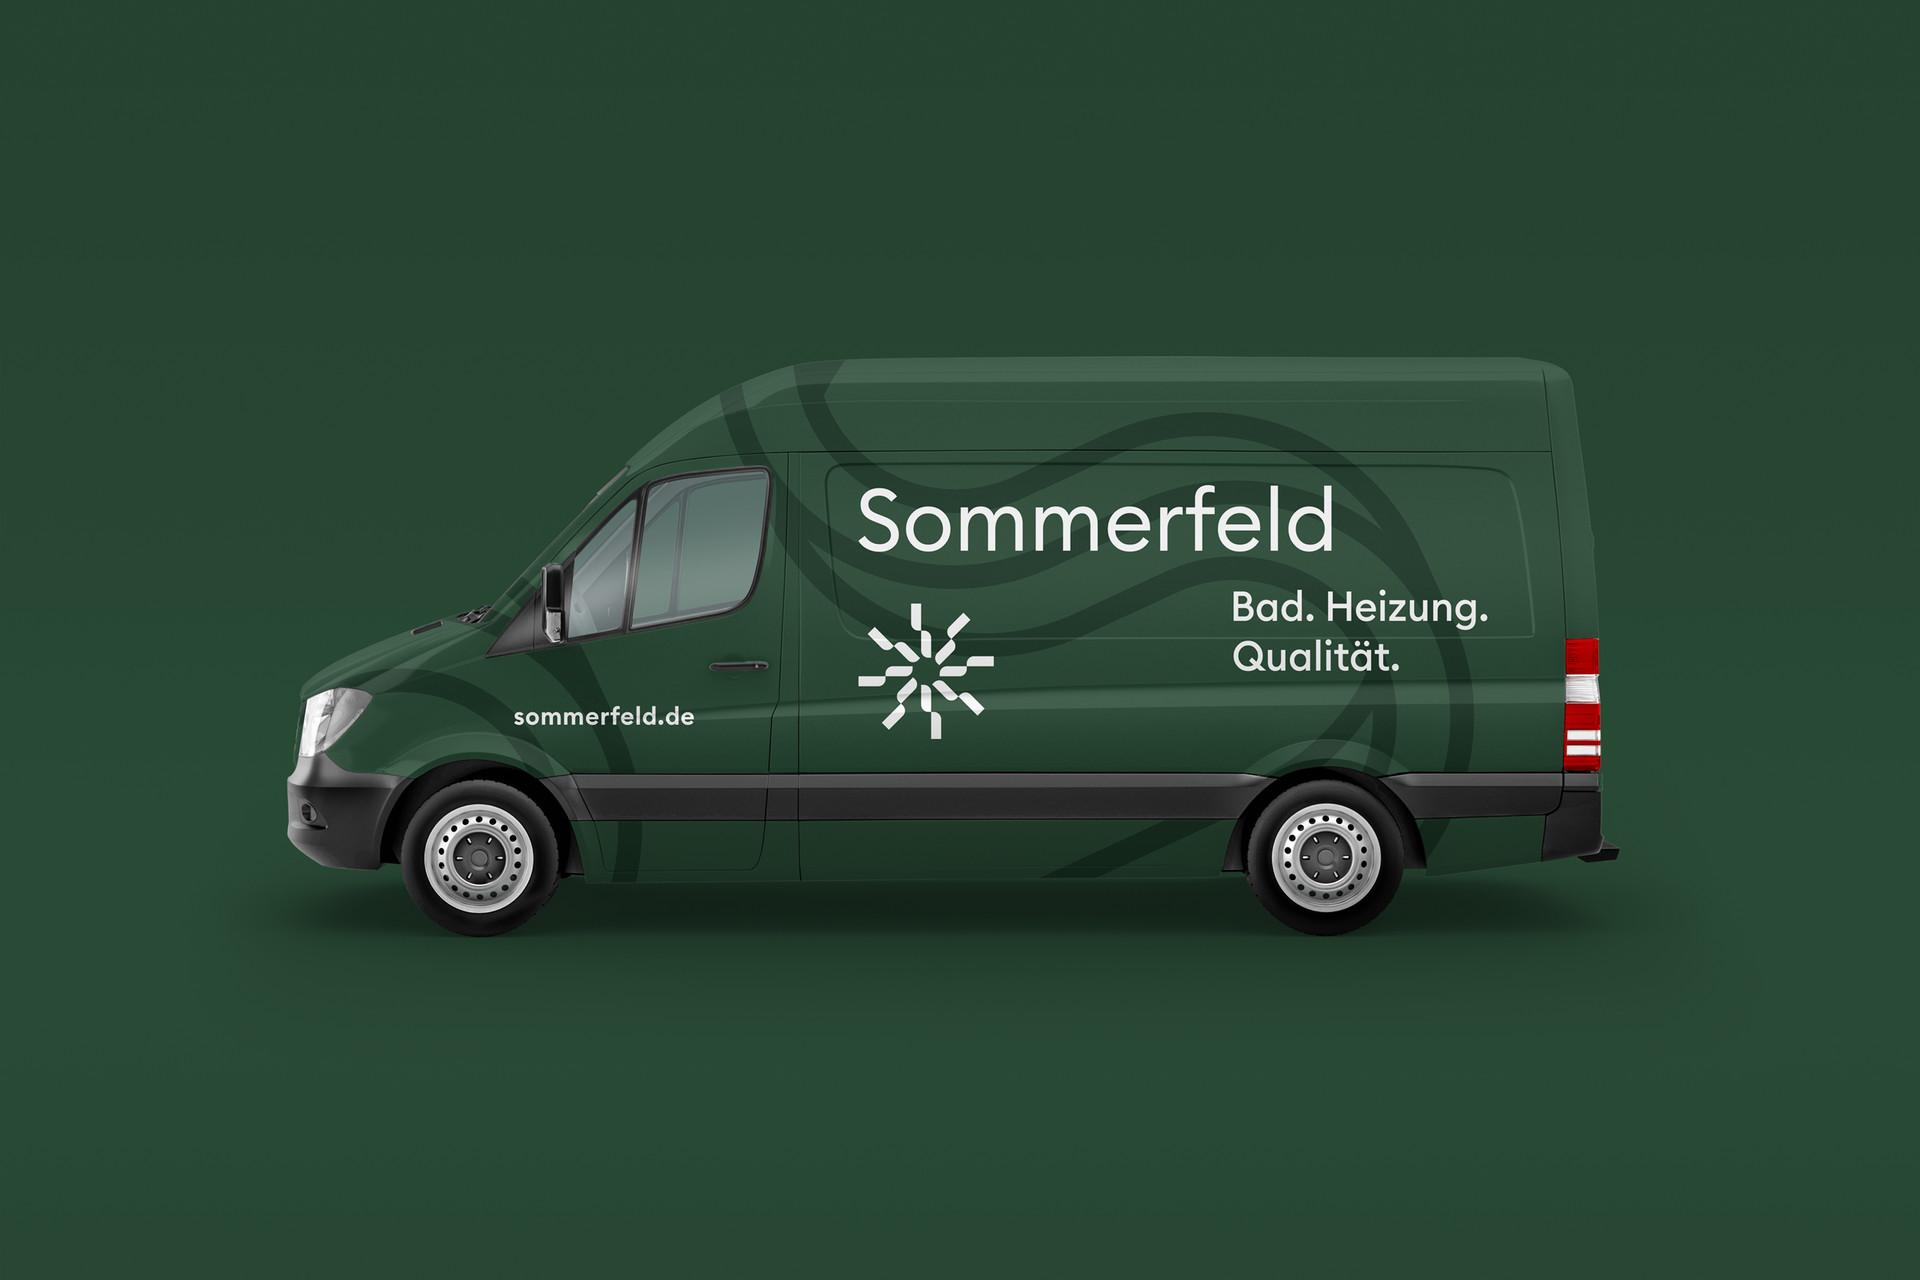 sl_Sommerfeld_40.jpg